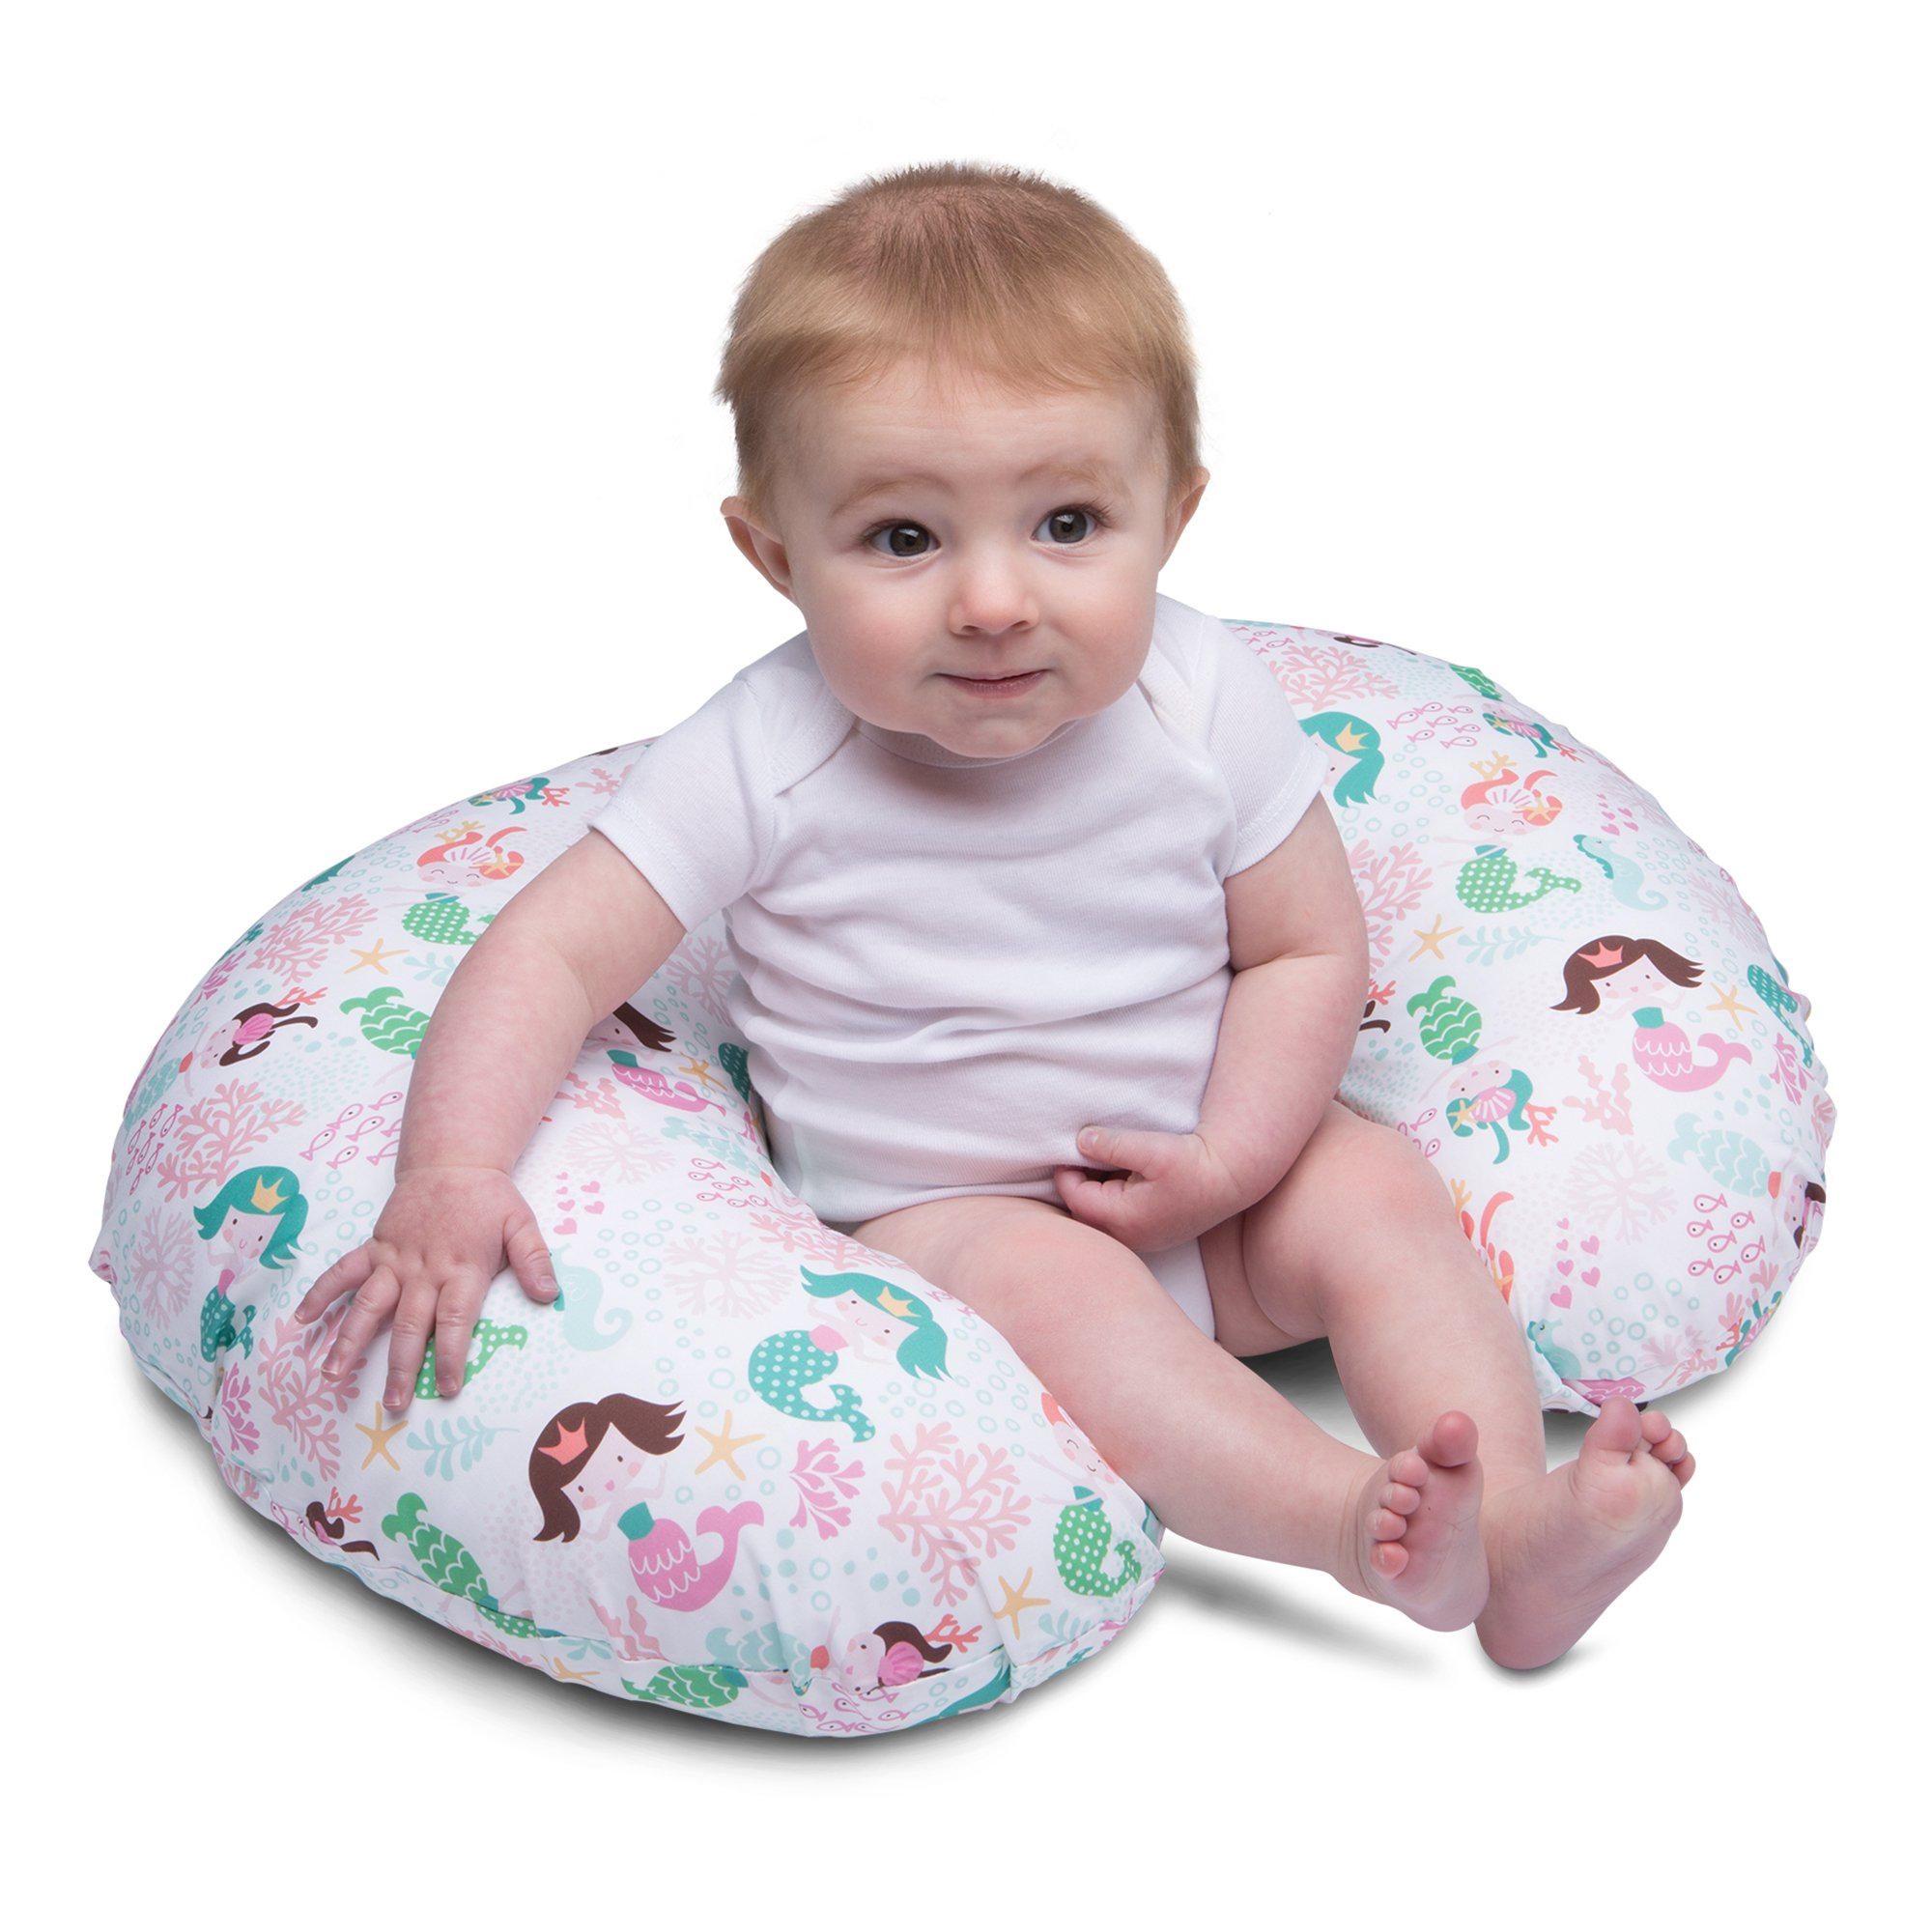 Boppy Pillow Slipcover Classic Mermaids Pink